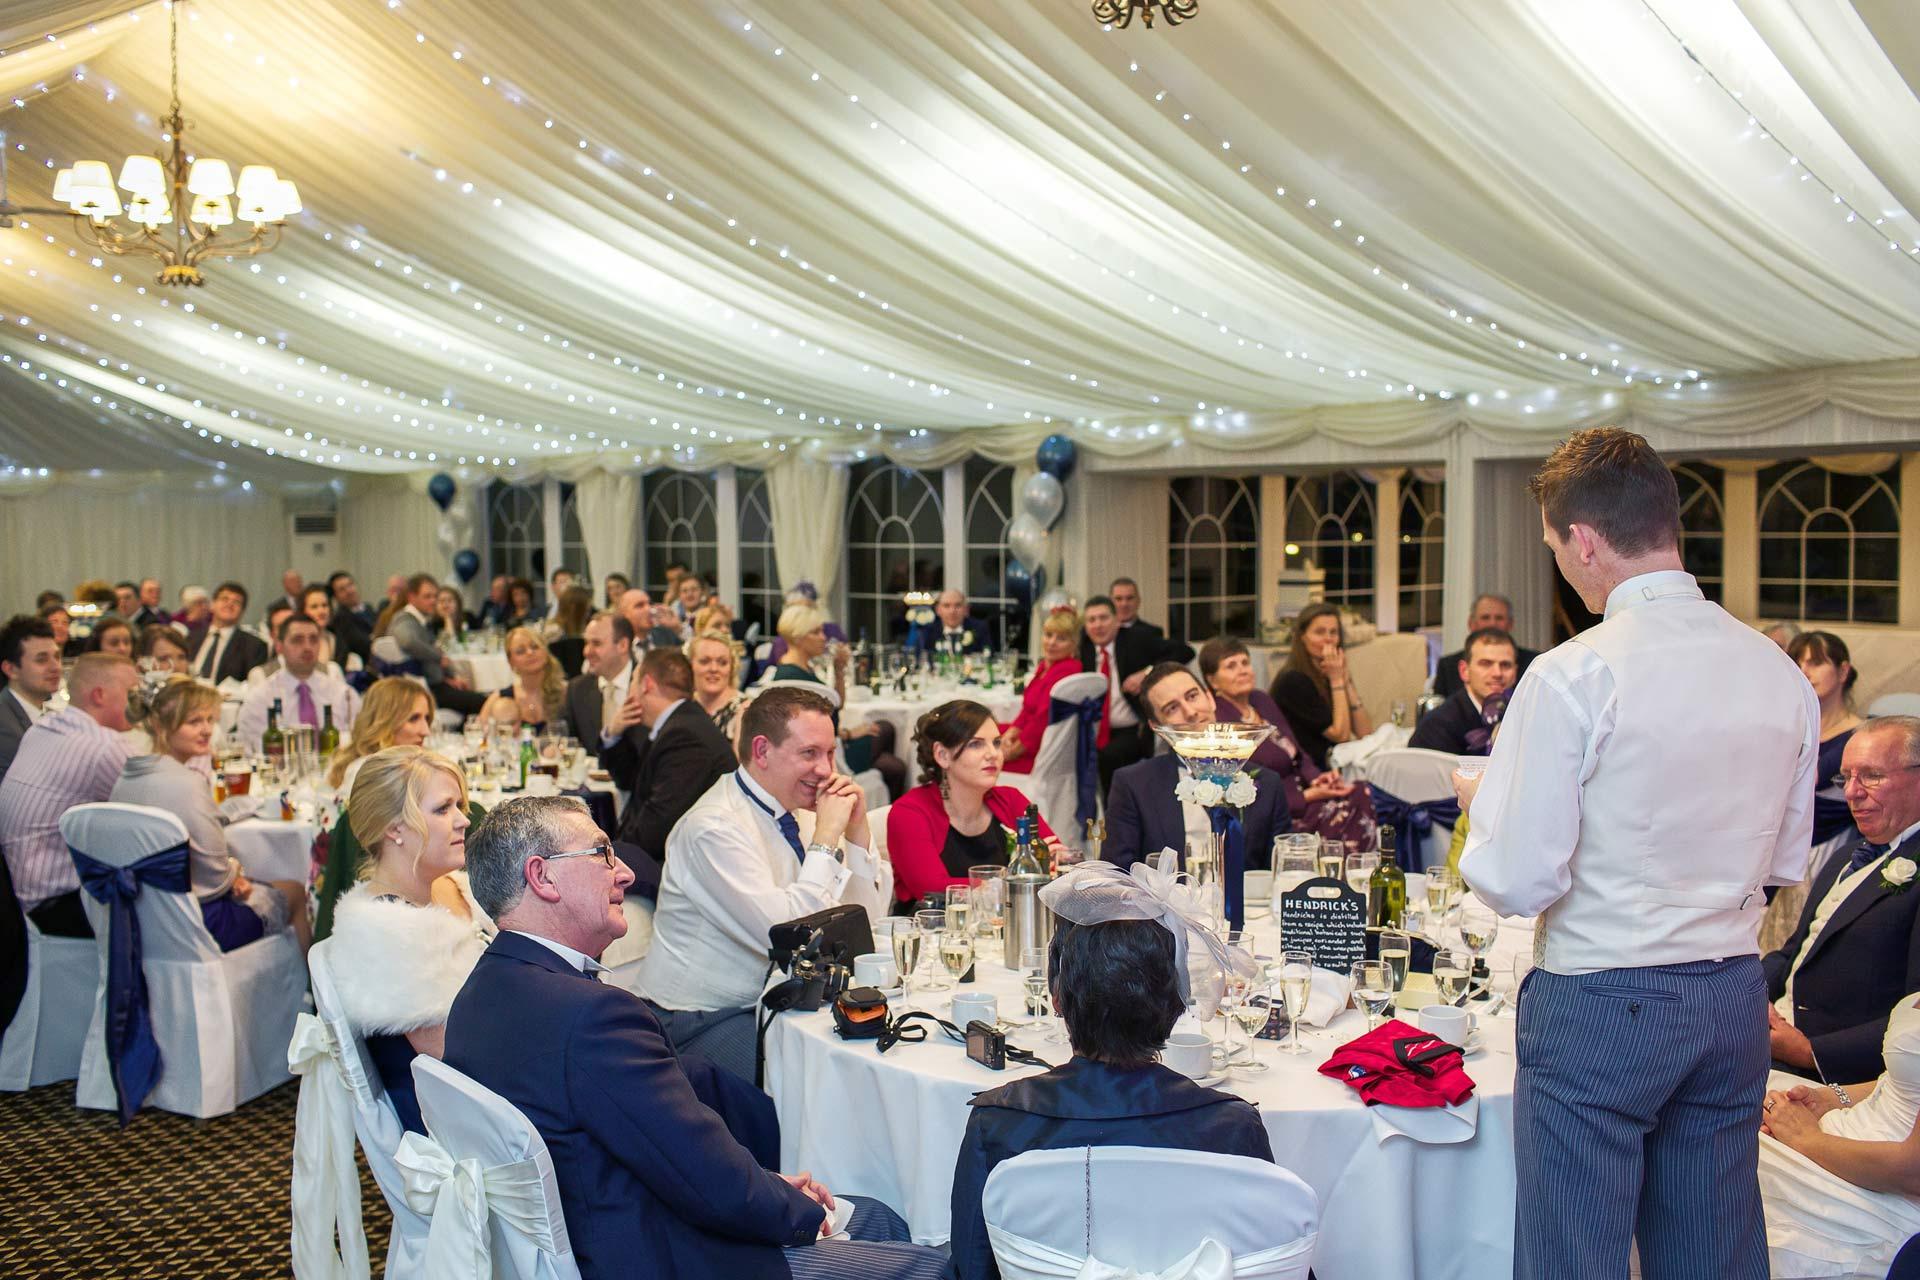 Audleys_Wood_Wedding_Photographer_Basingstoke_028.jpg